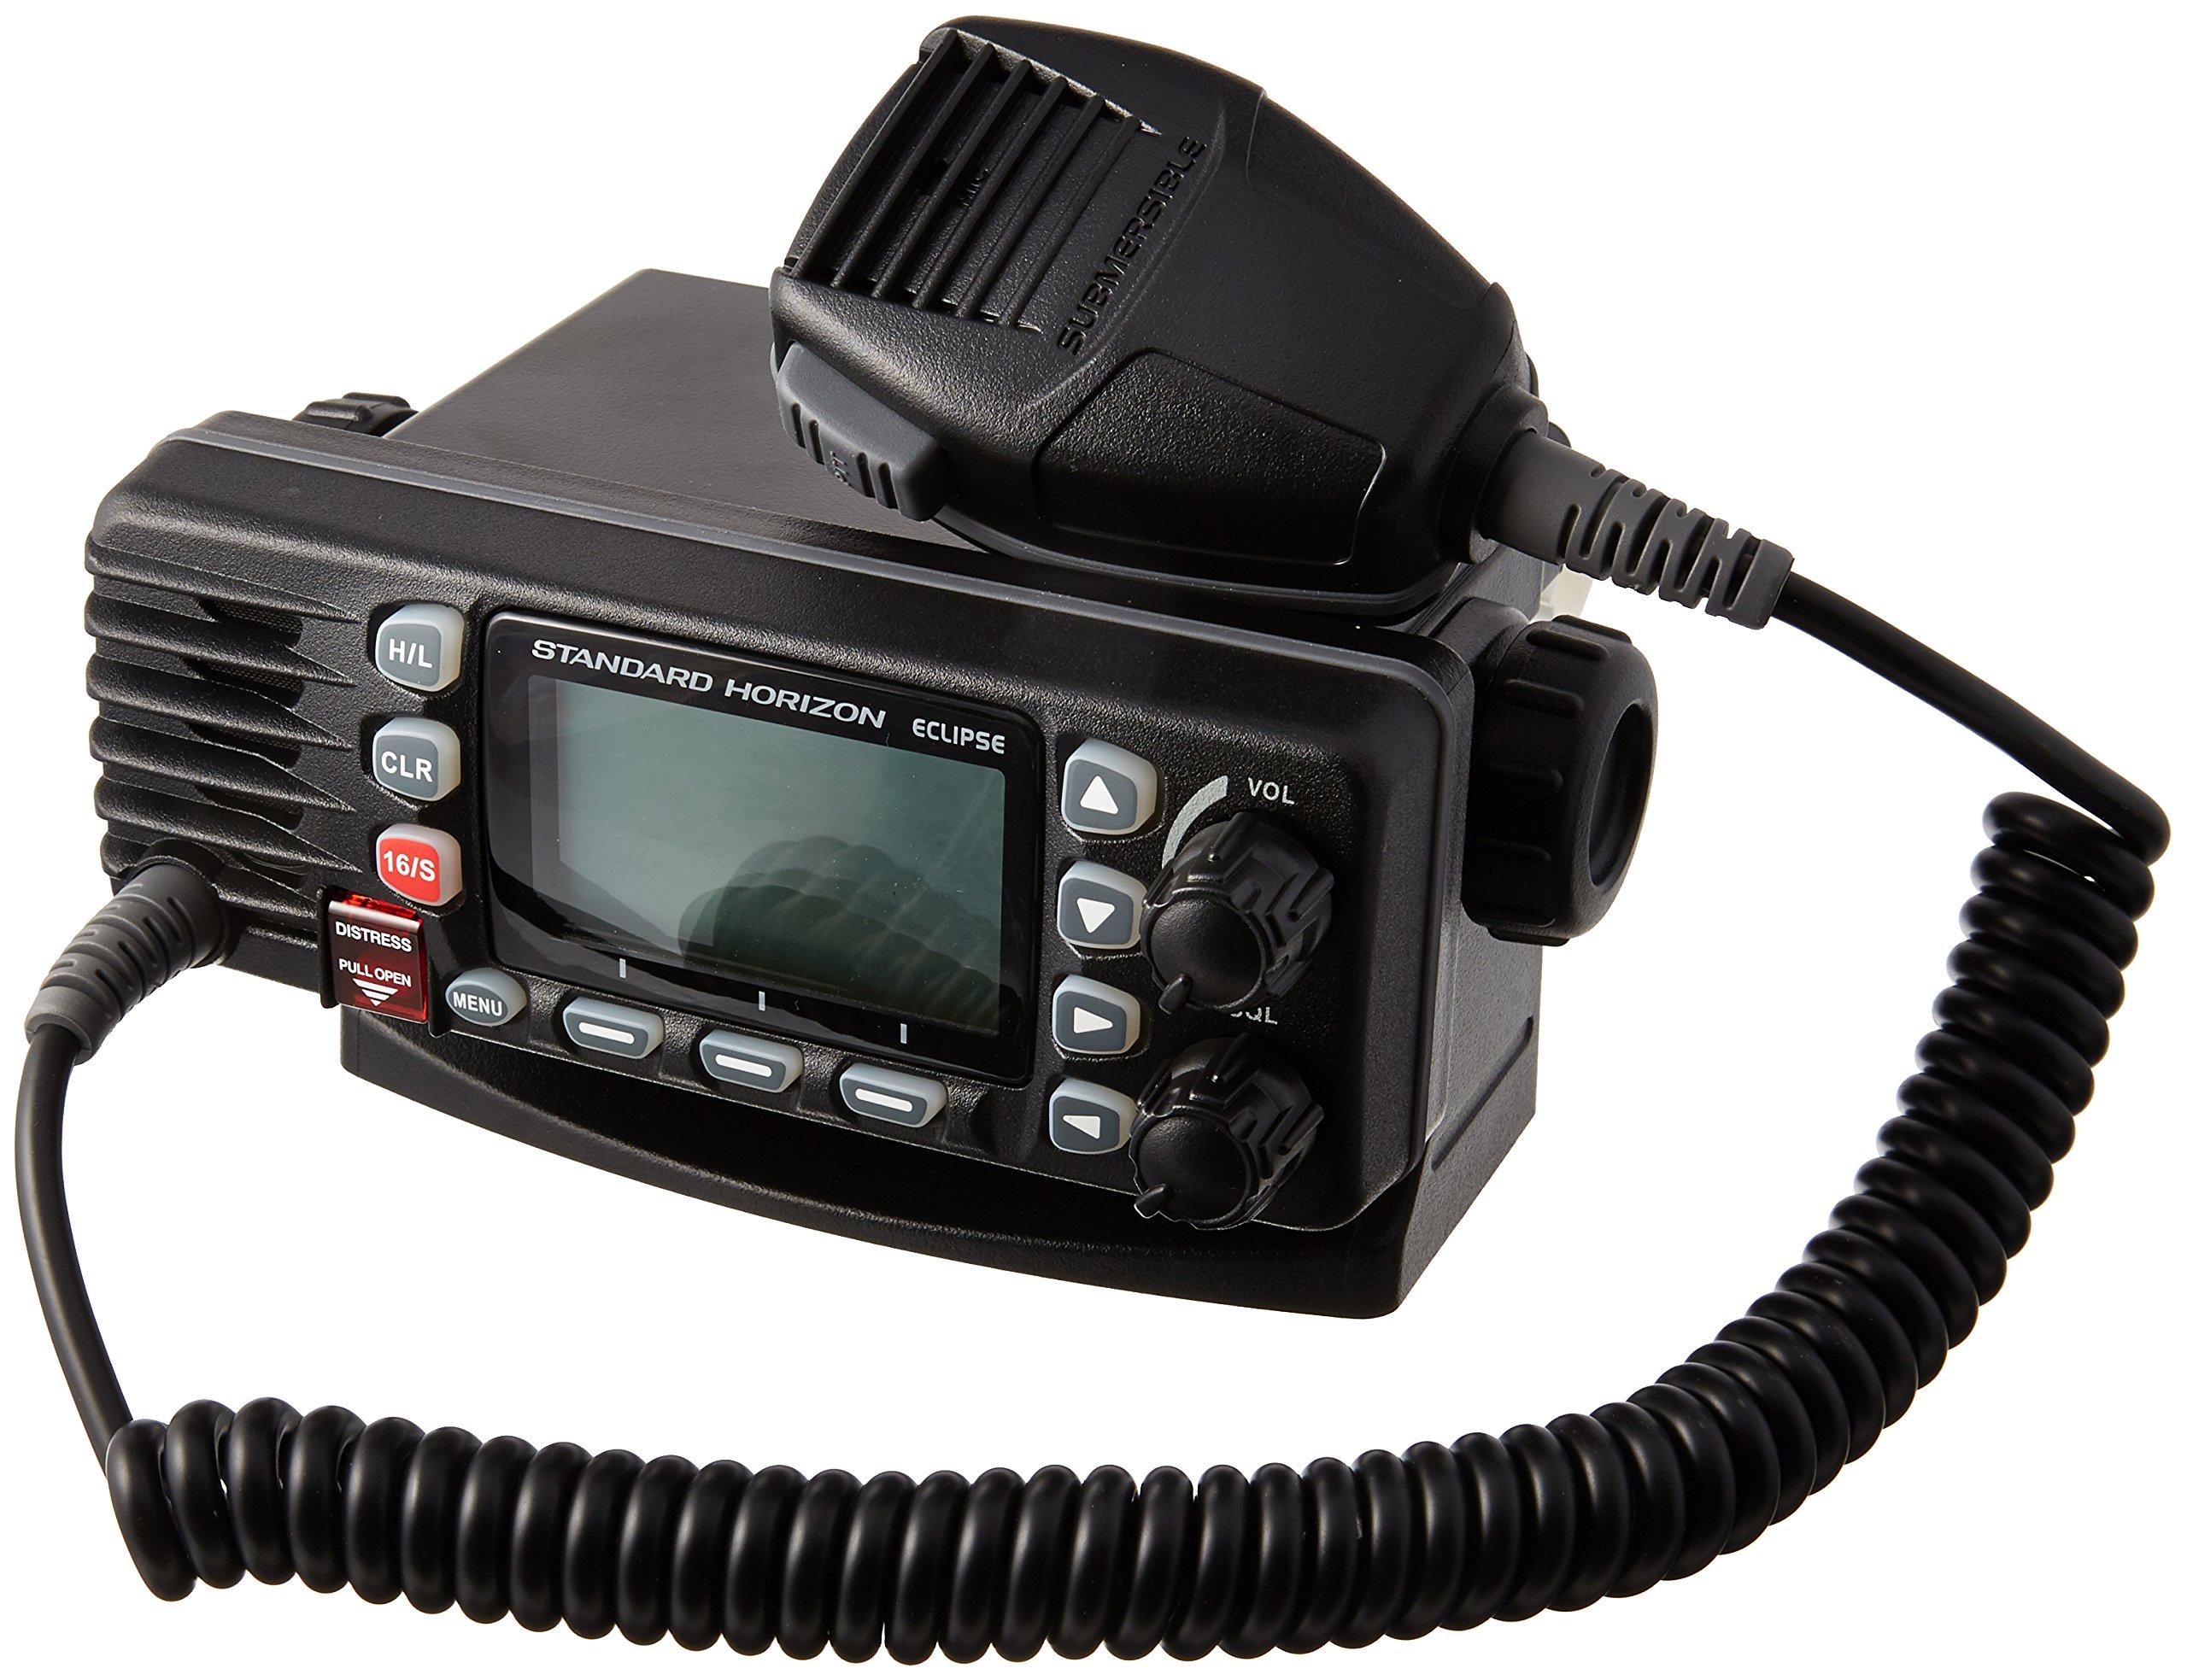 Standard Horizon GX1300B VHF, Eclipse, Basic, Black by Standard Horizon